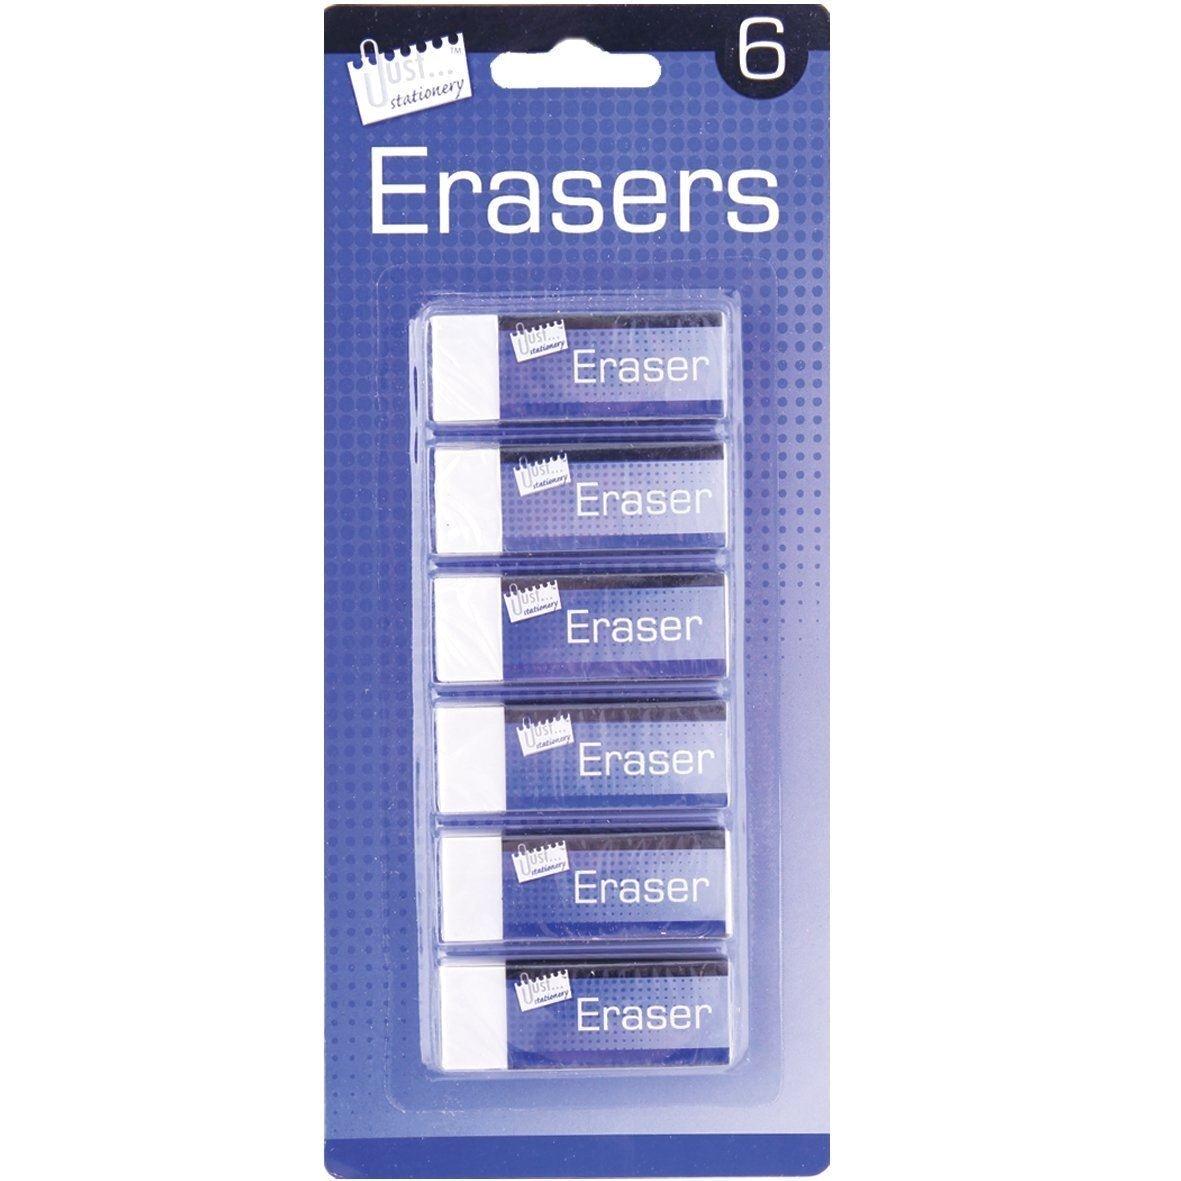 6 ERASERS